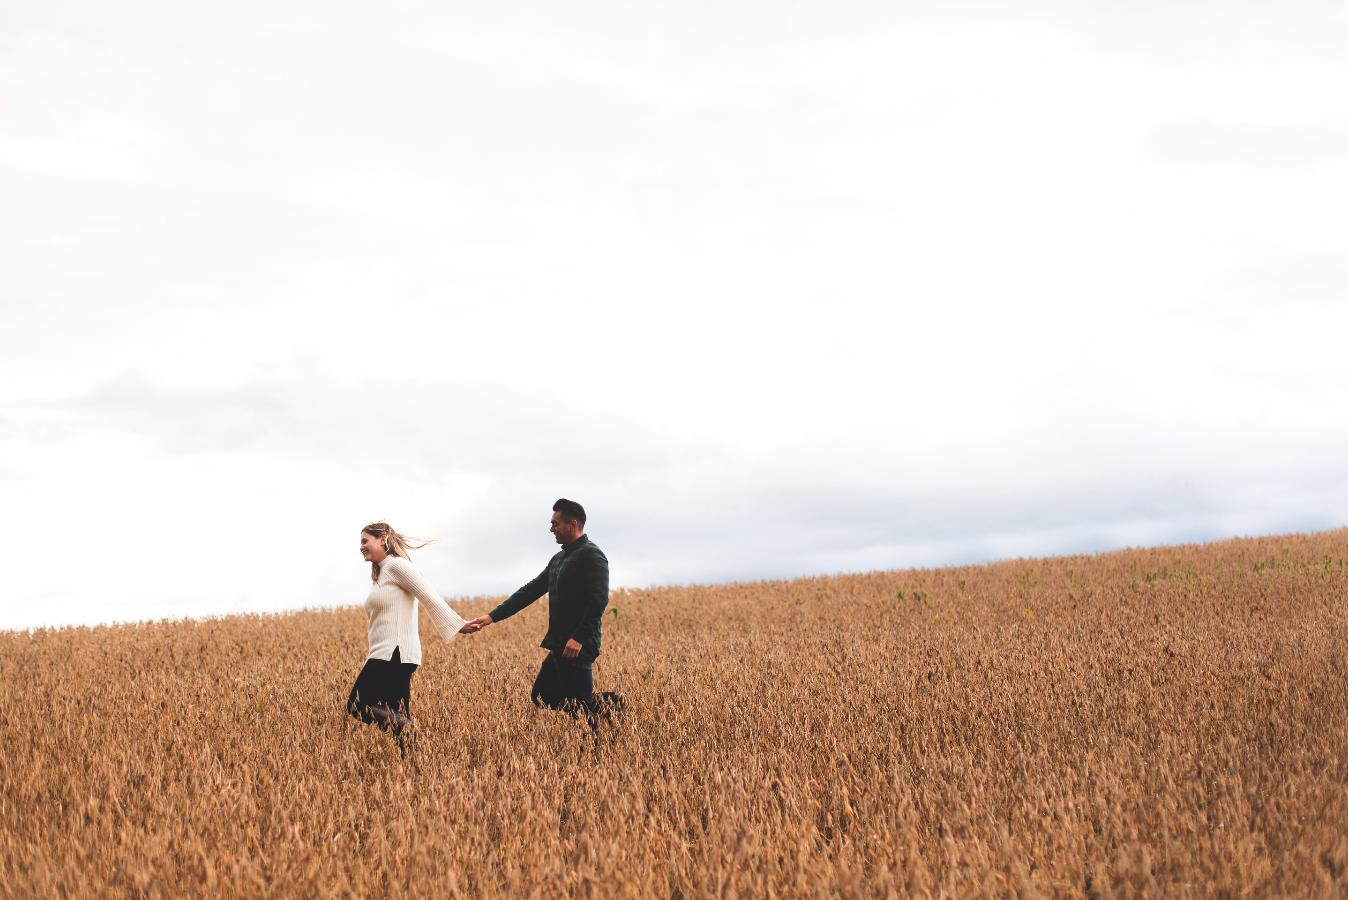 Engagement-Photography-Bruce-Trail-Rain-Hamilton-Burlington-Oakville-Niagara-Toronto-Wedding-Photographer-Photo-Image-12.png